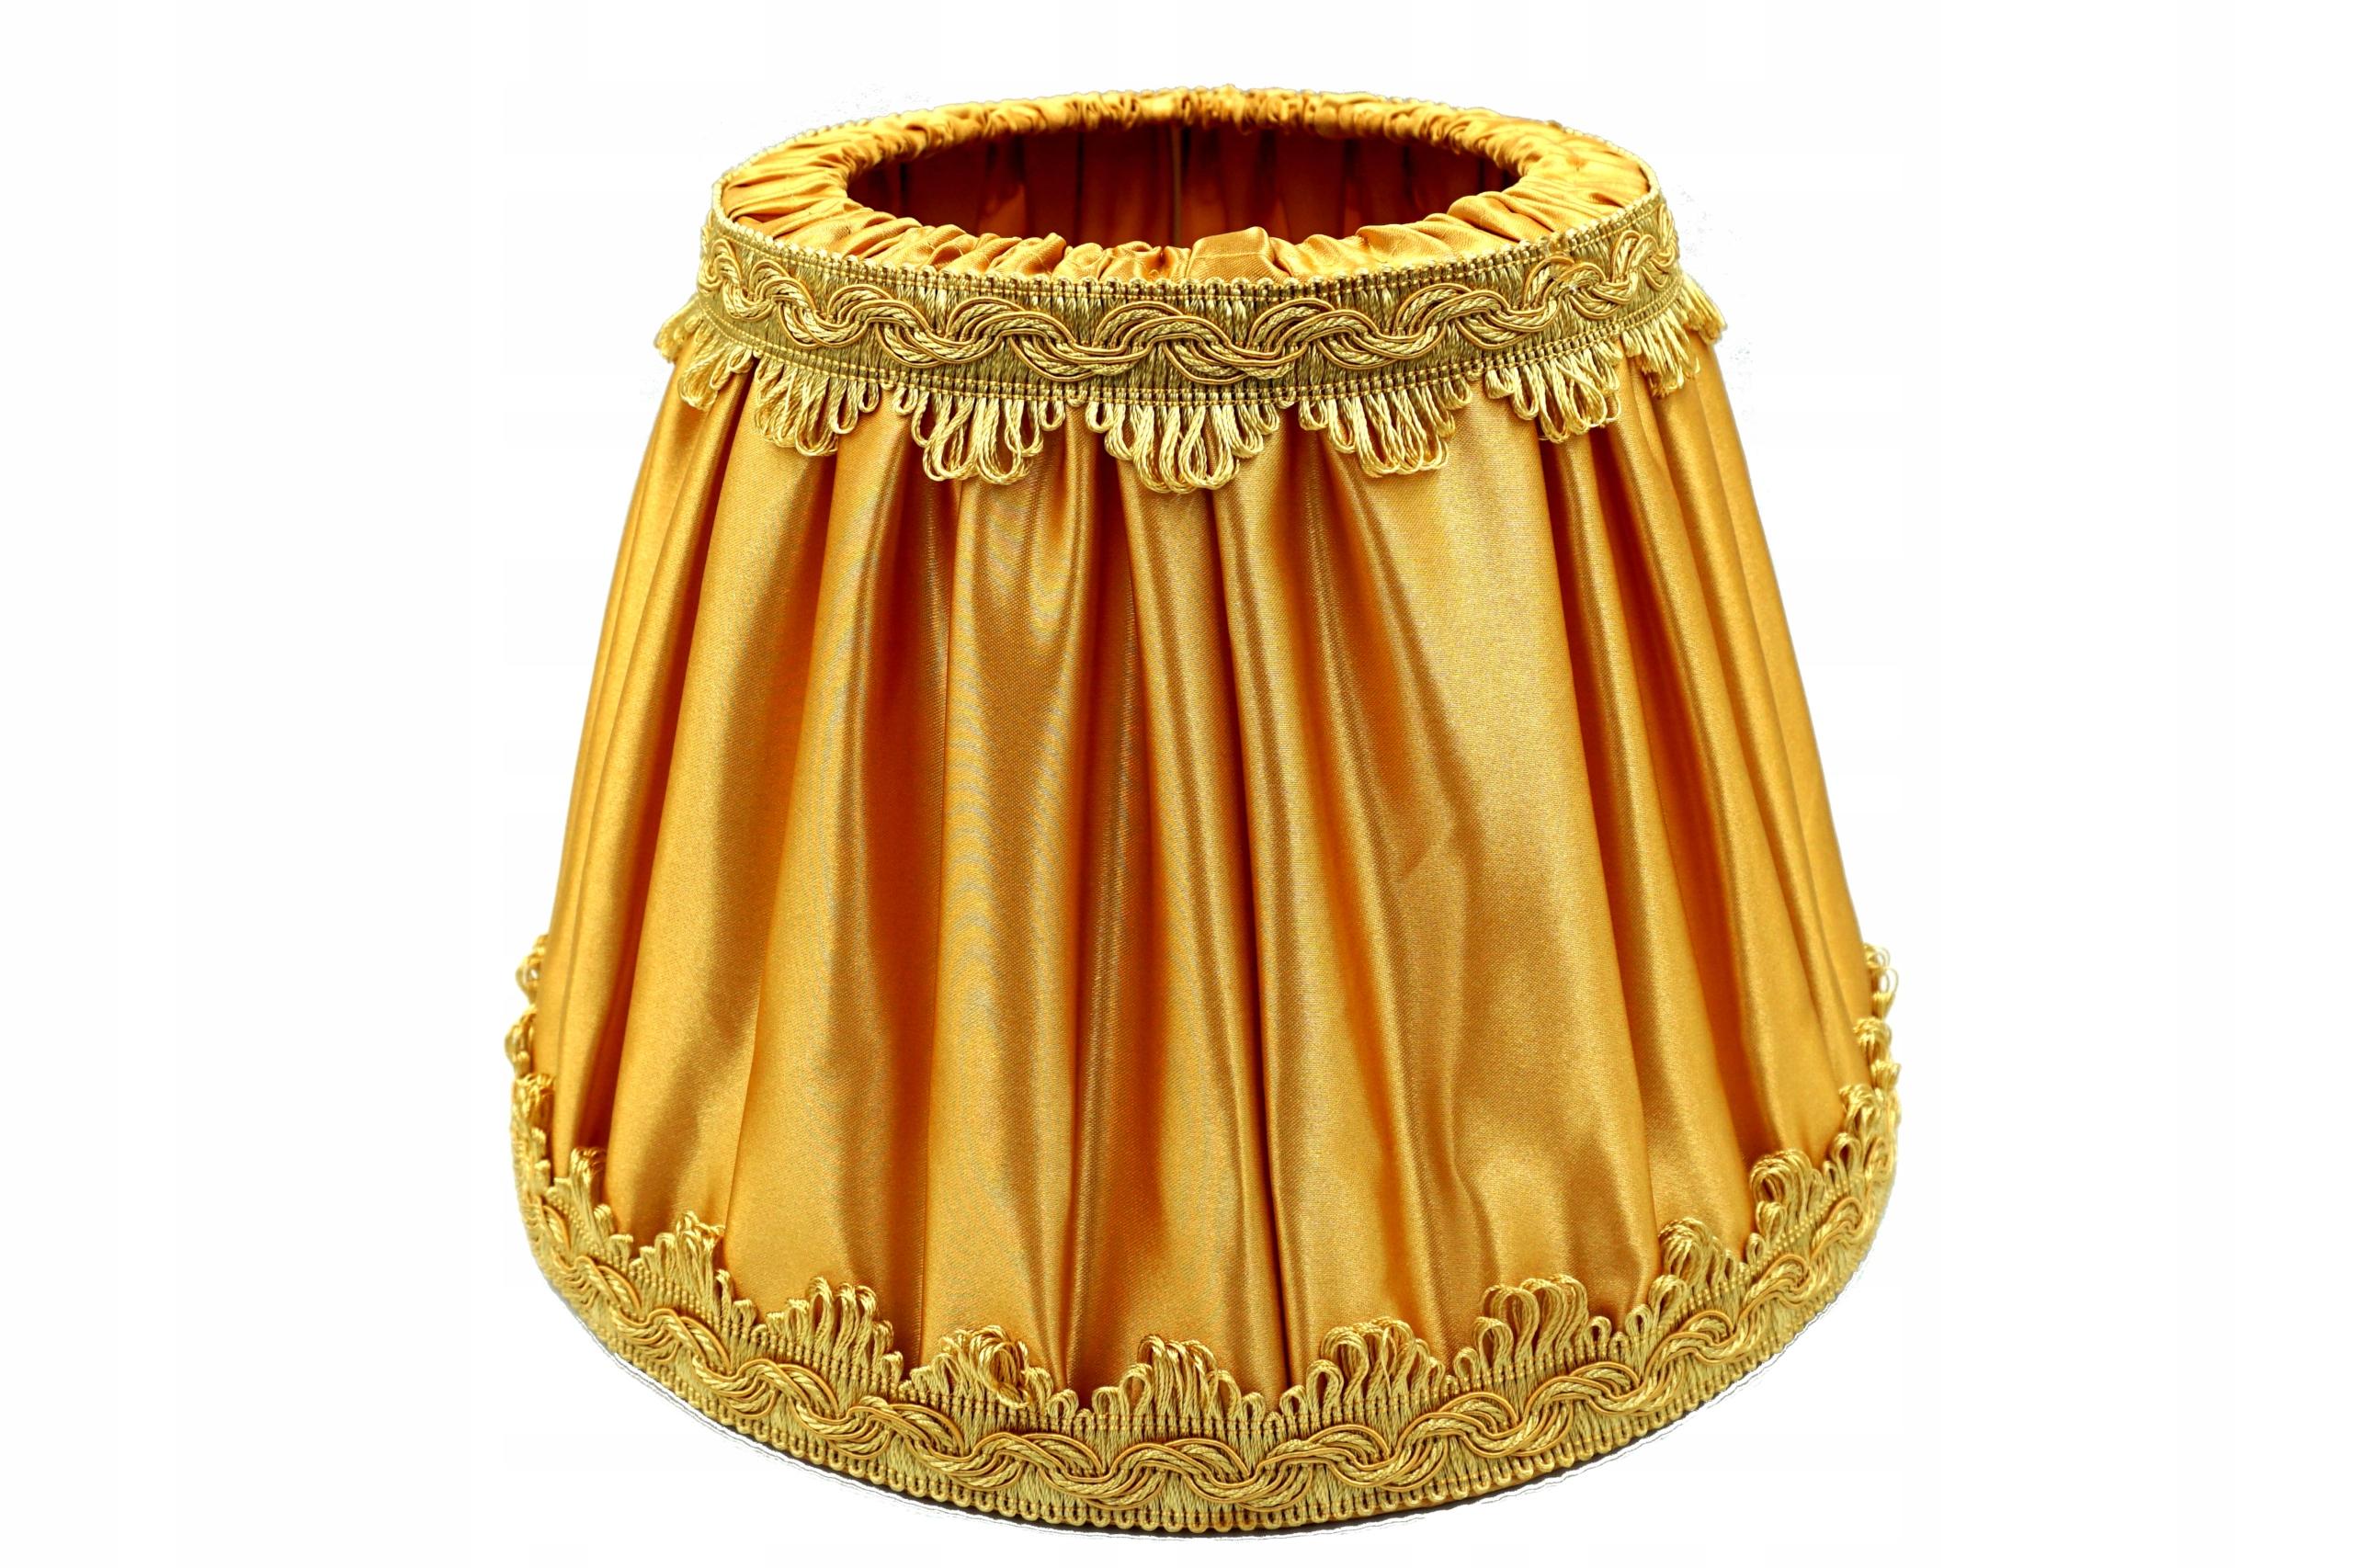 Tienidlo Retro Itaka zlato / zlato 18x30x21 cm